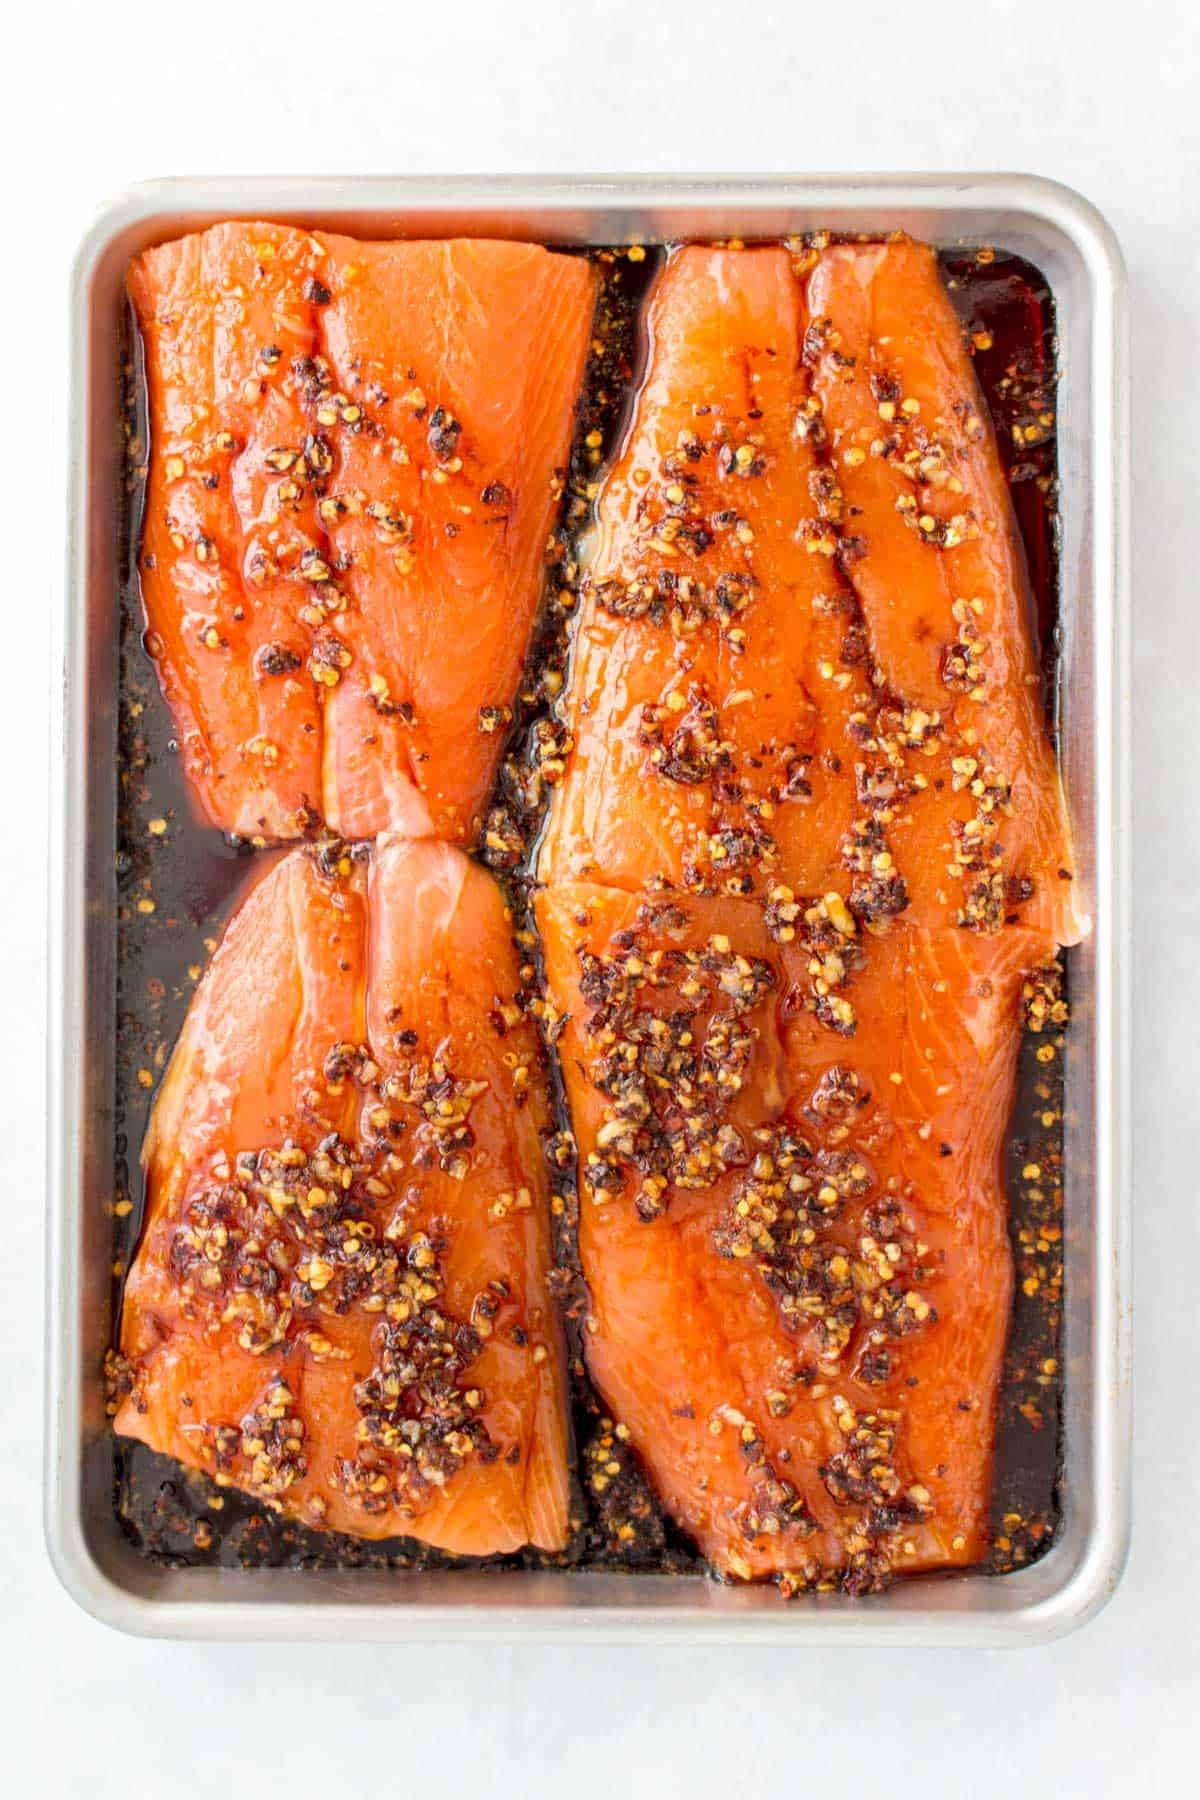 Salmon fillets marinating in a sheet pan.